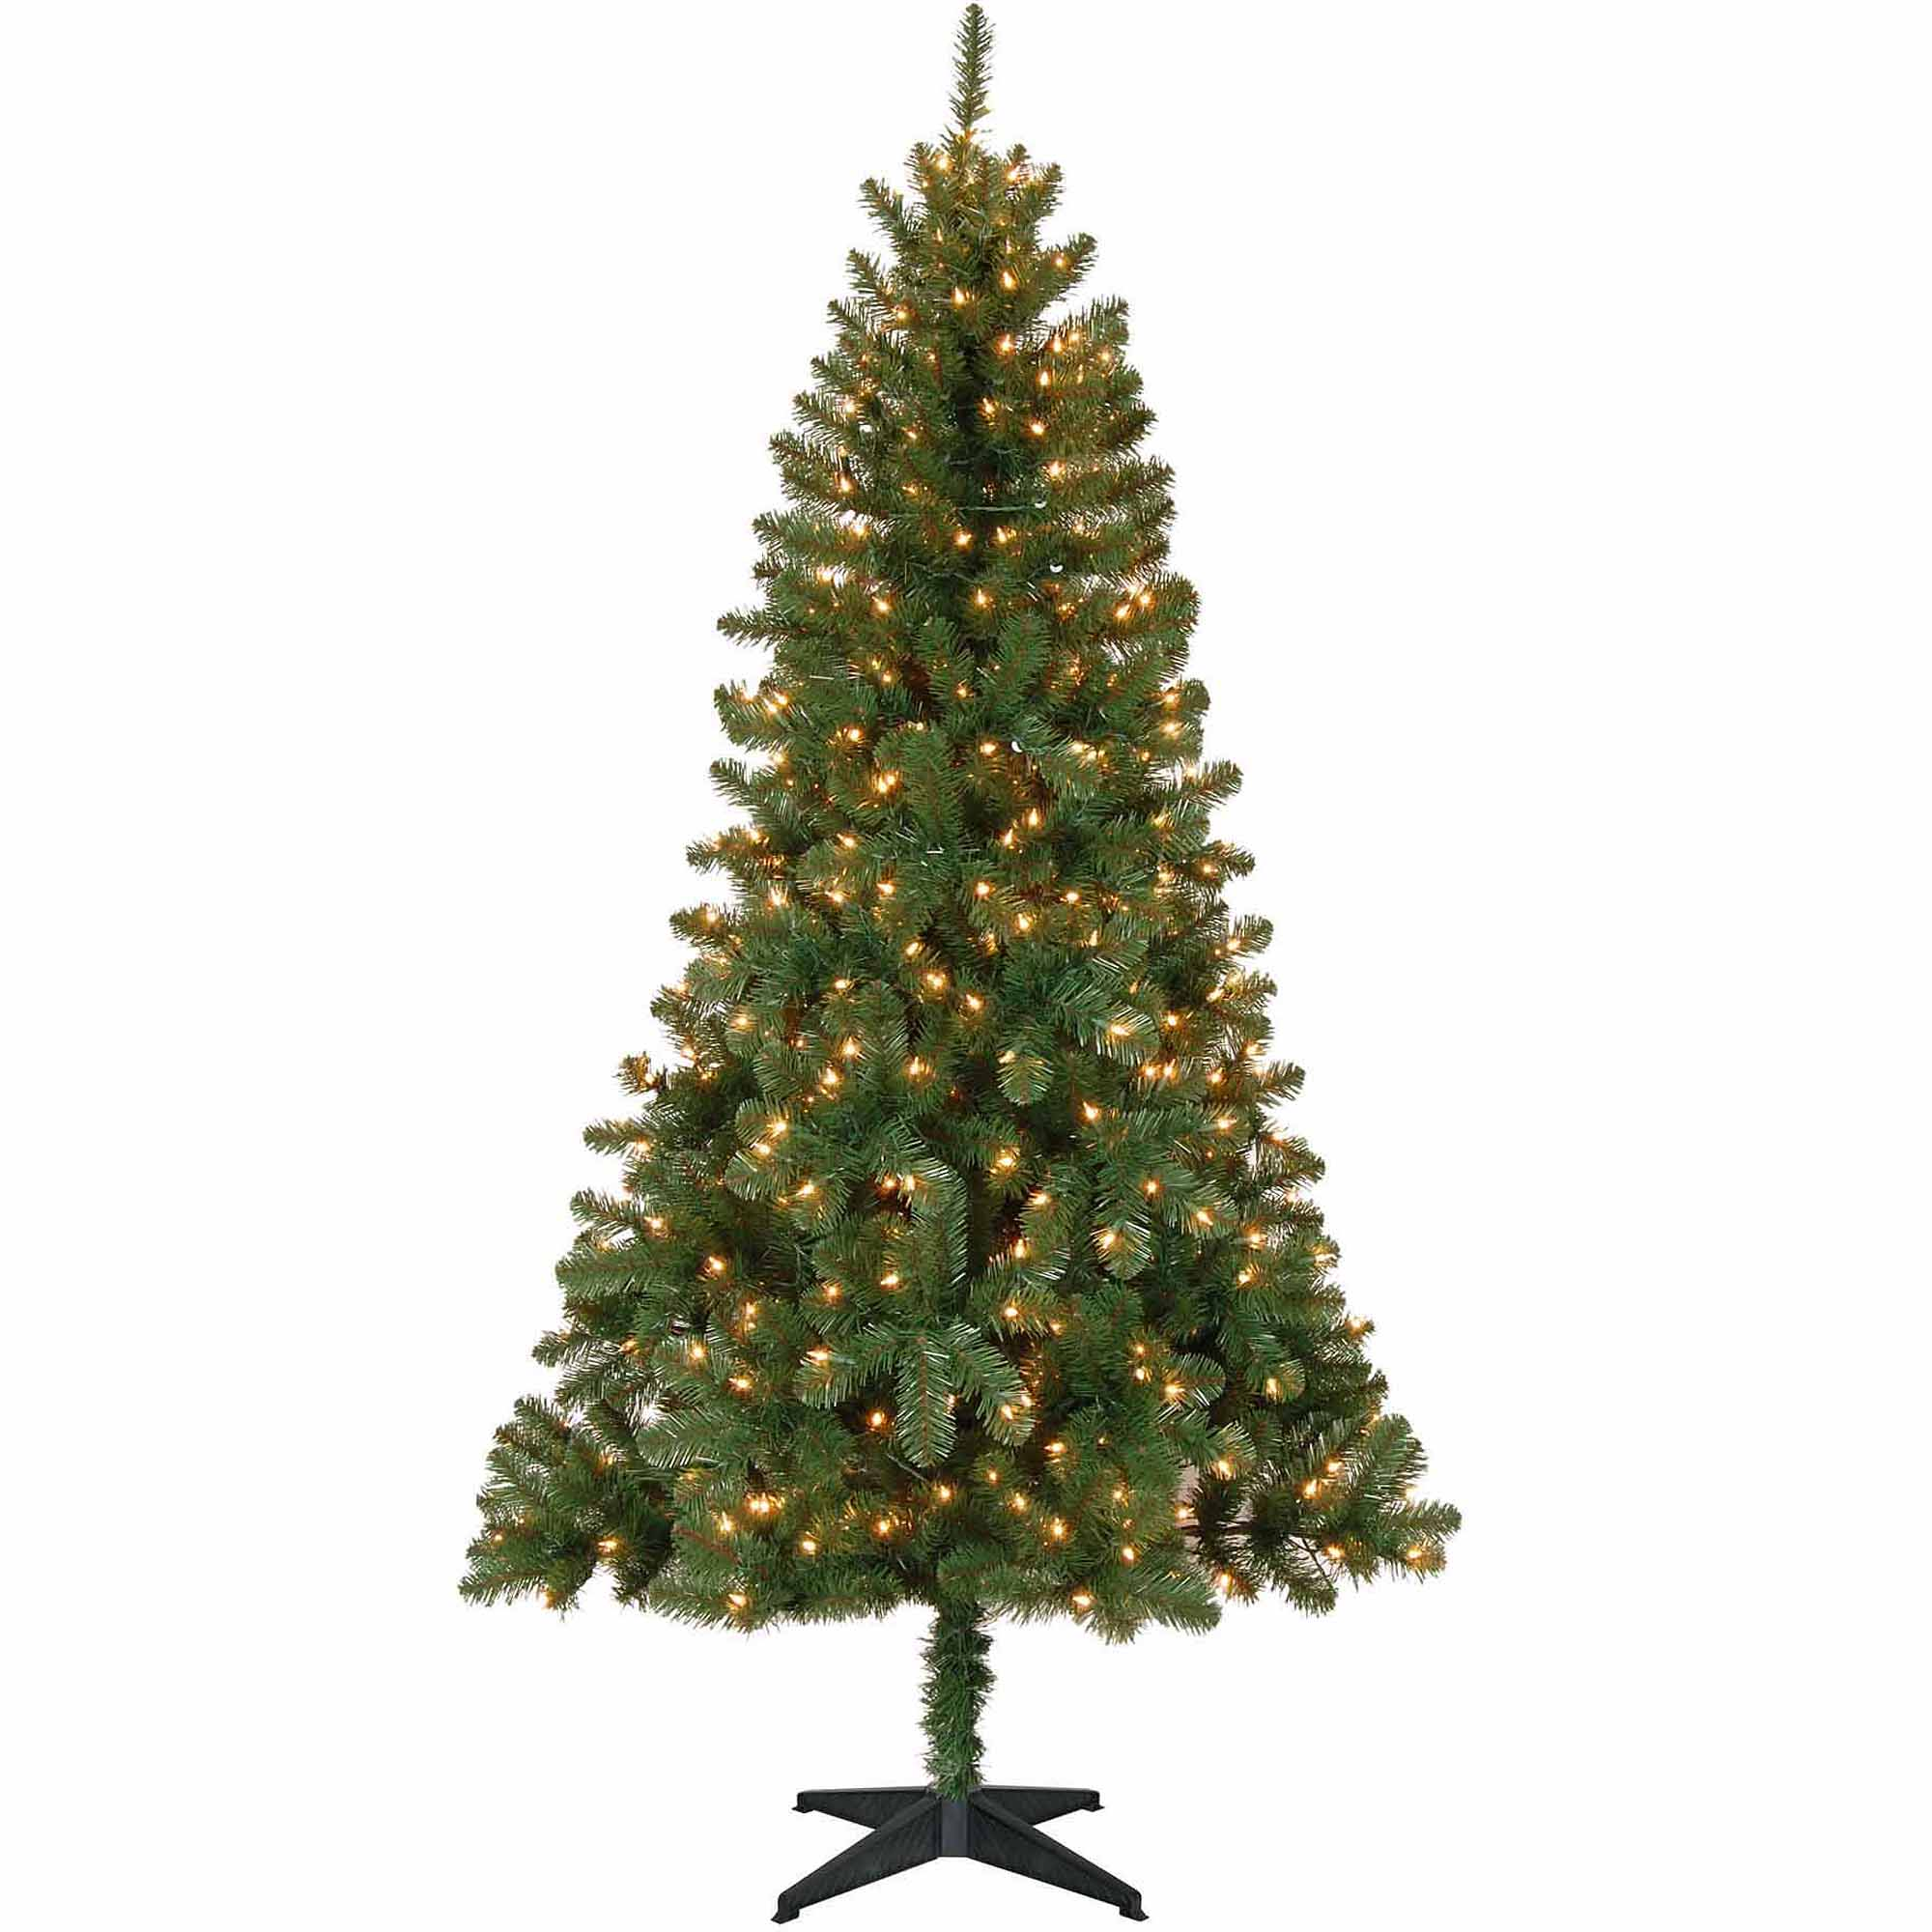 Real christmas trees with lights - Holiday Time Pre Lit 6 5 Madison Christmas Tree Green Clear Lights Walmart Com